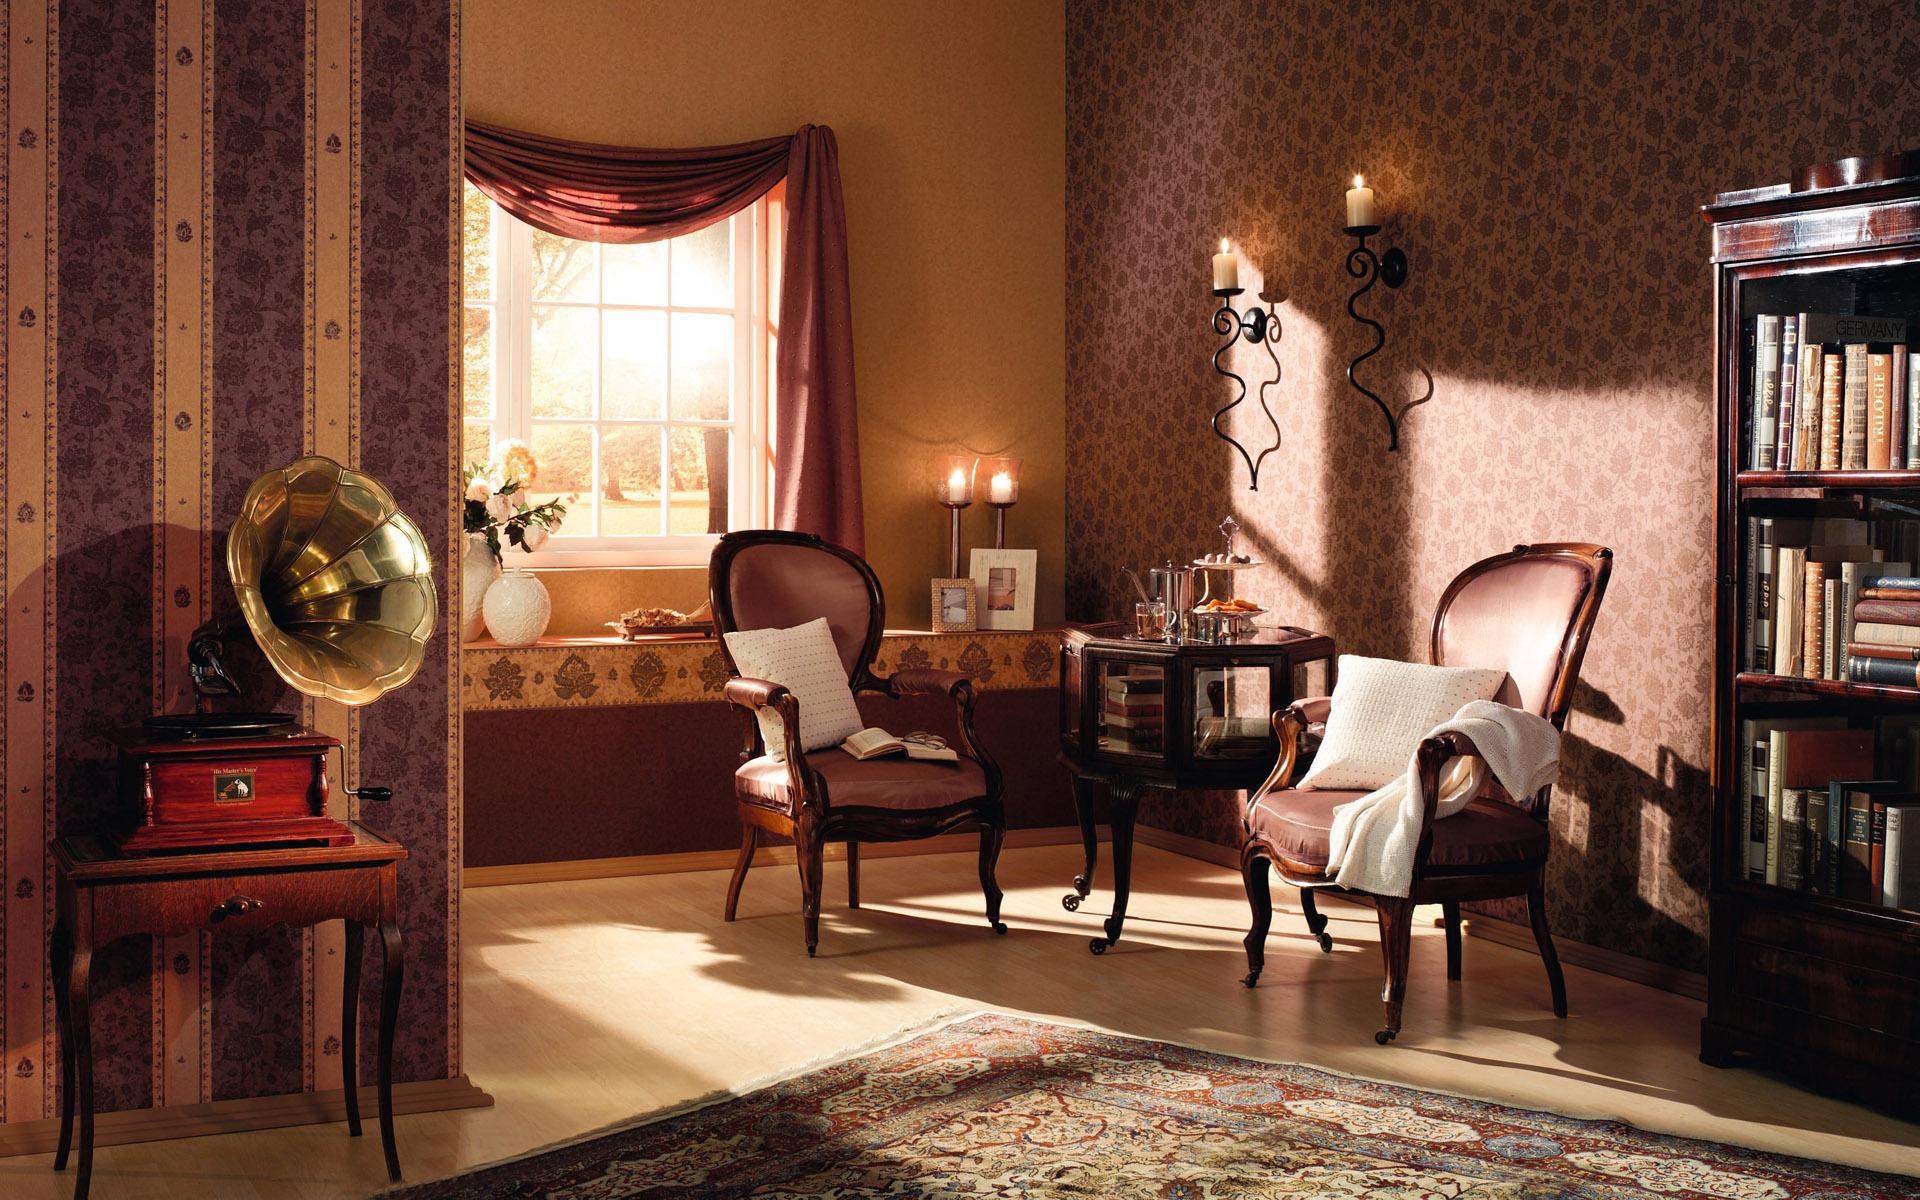 Living_room_interiors7 Living room interior decor